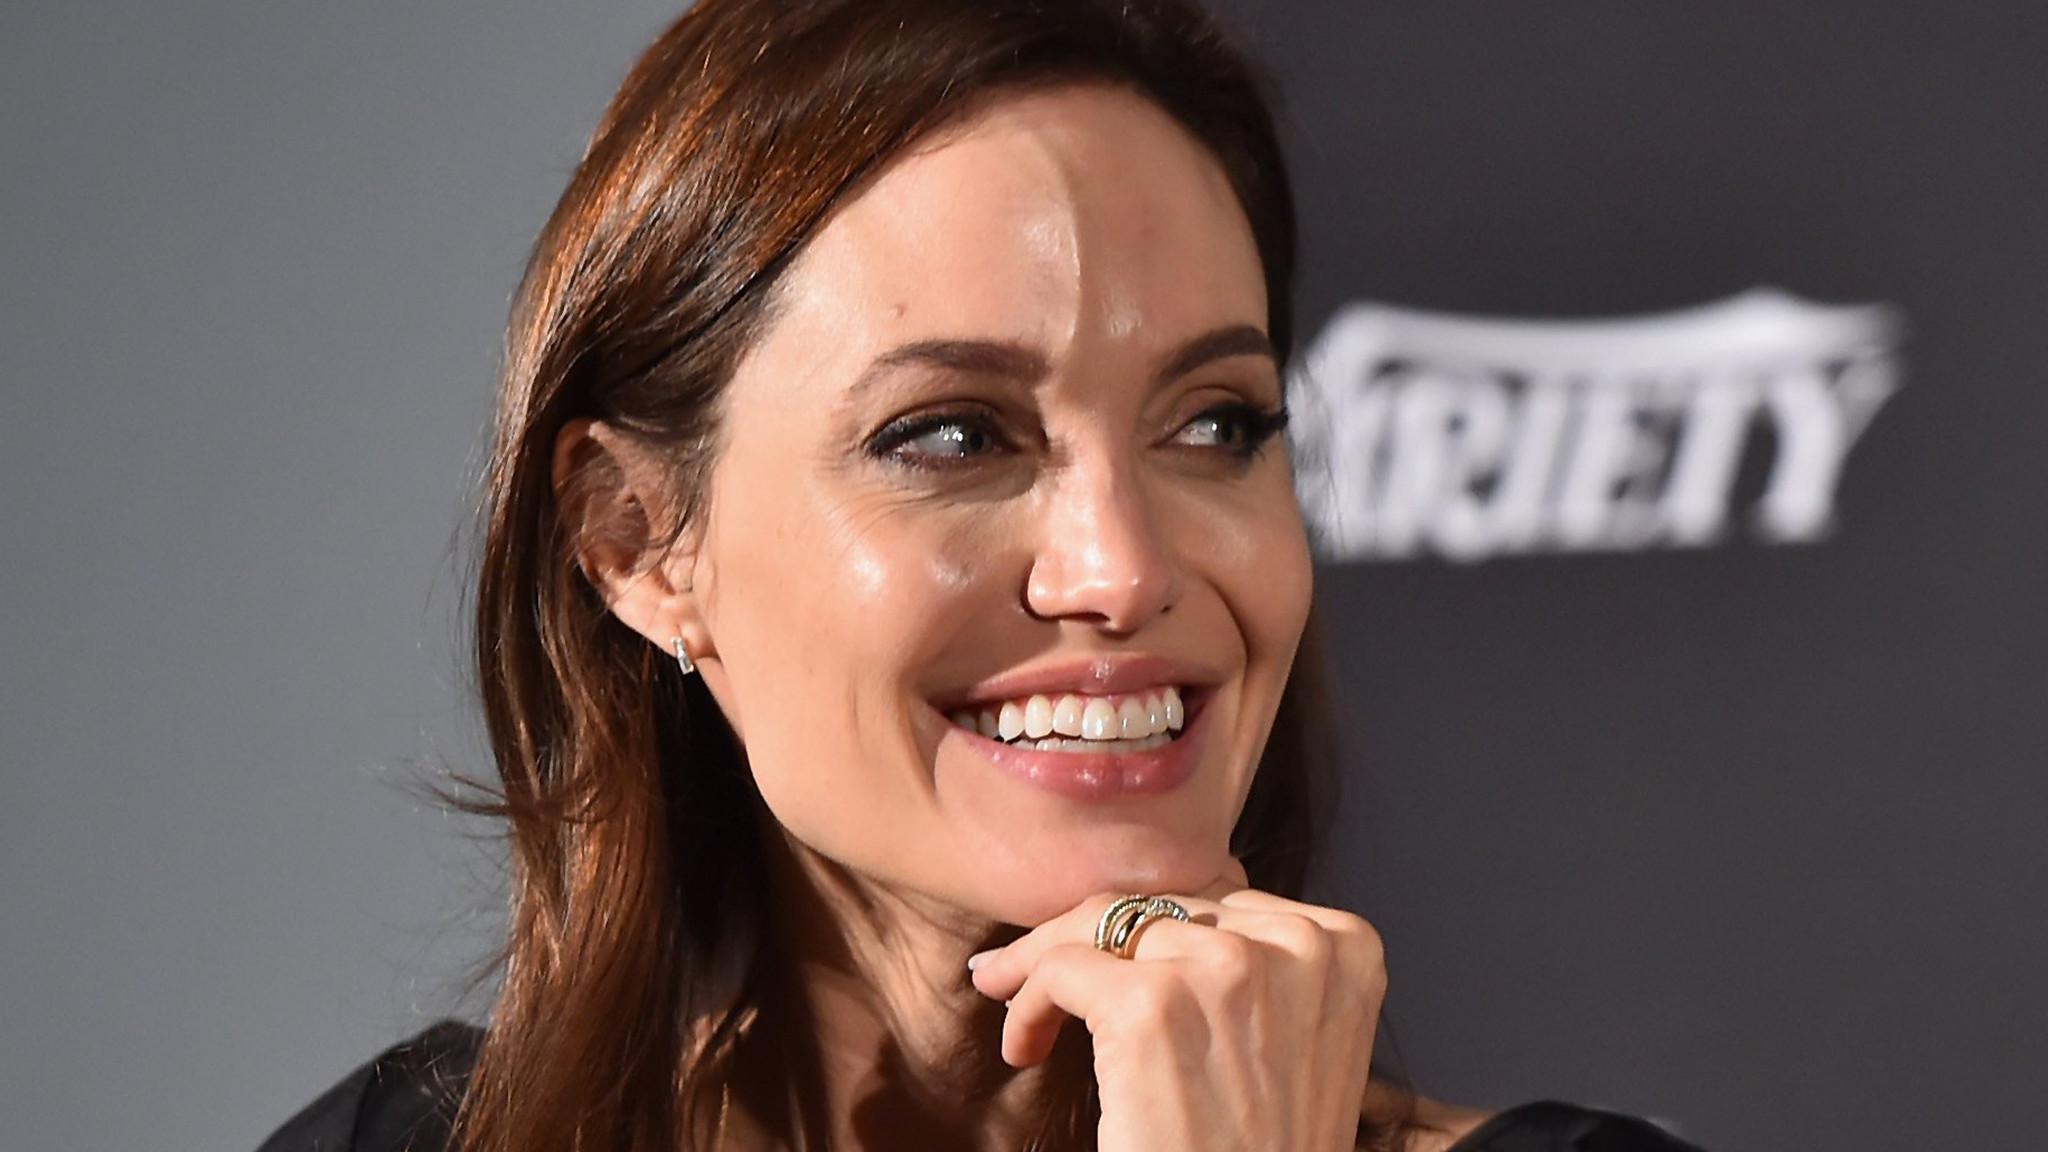 Angelina Jolie goes viral: She has chicken pox - LA Times Angelina Jolie